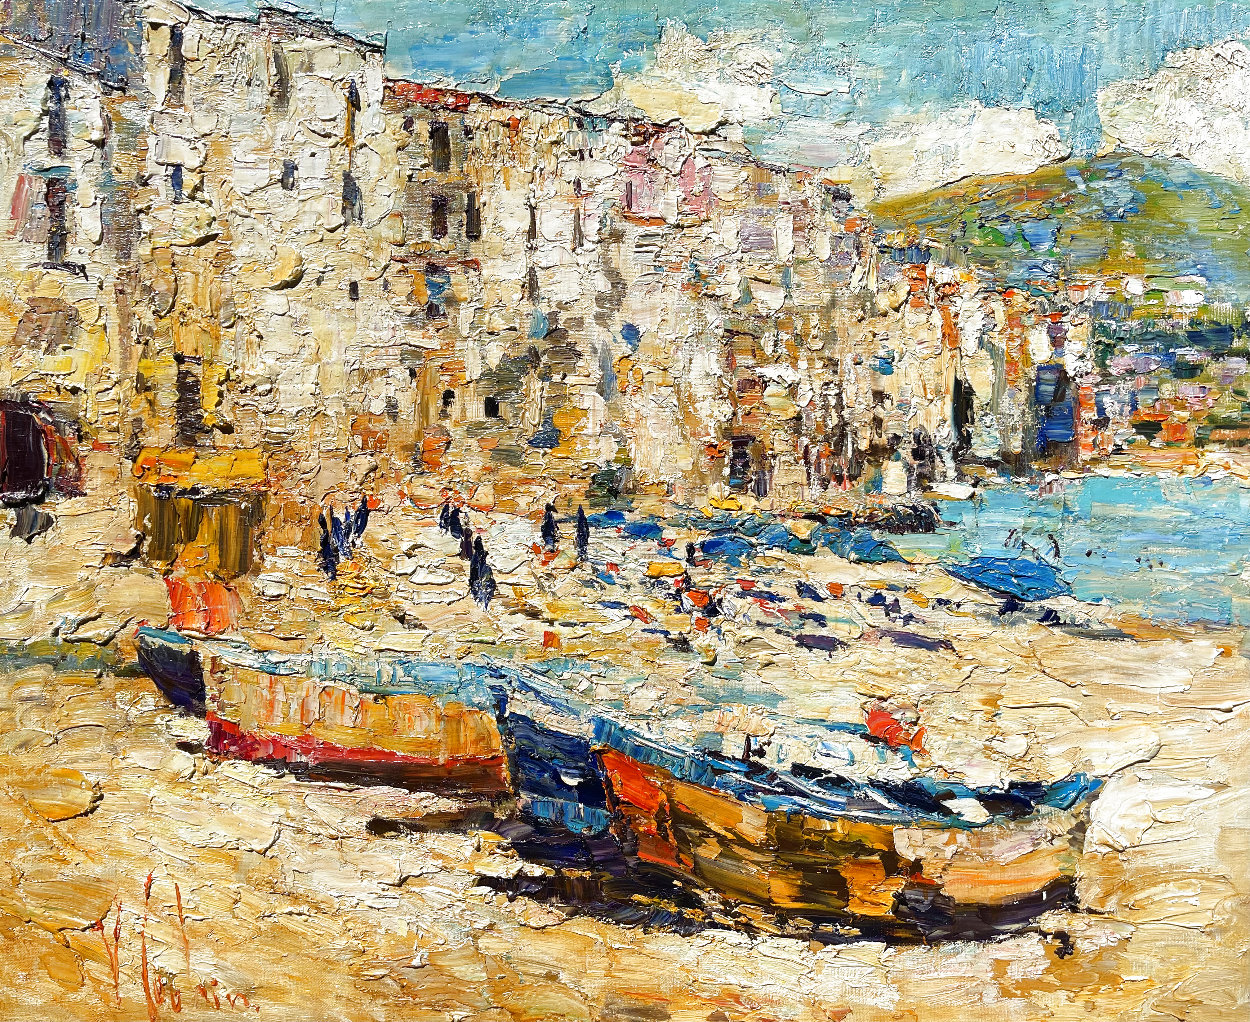 Sicily, Cefalu 2016 38x46 Super Huge Original Painting by Vladimir Mukhin